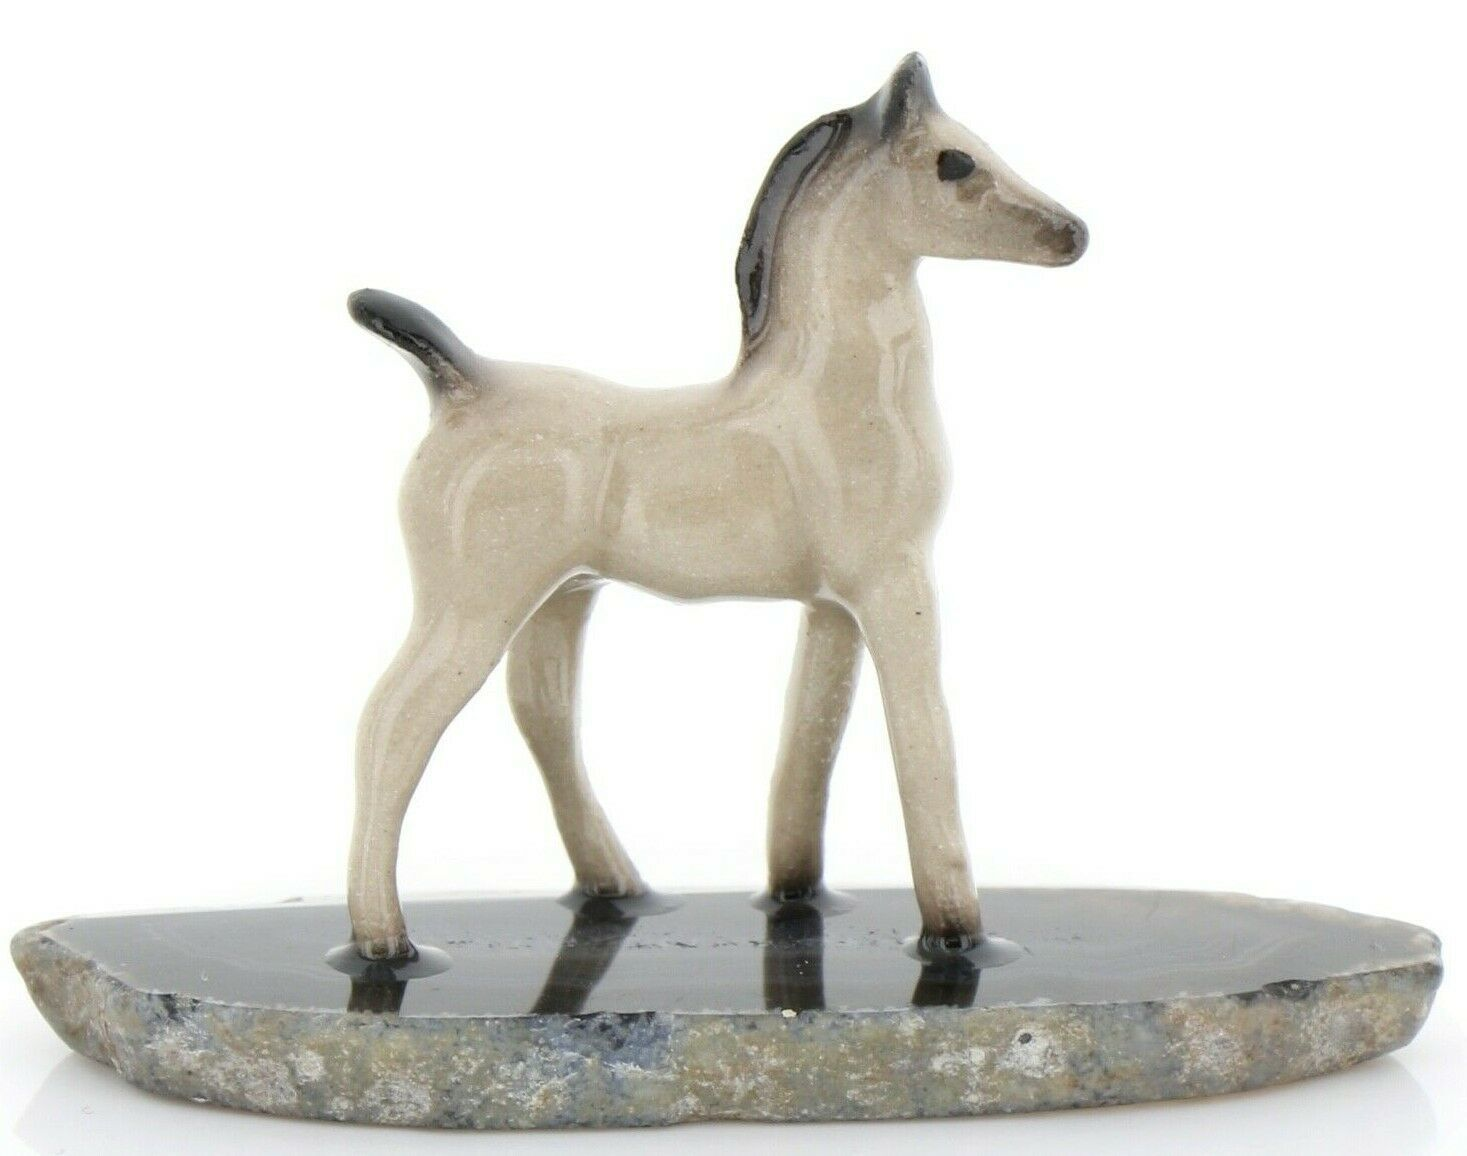 Stepping Stones Fairy Garden Miniature Tiny Gray Horse on Quartz Base #2745